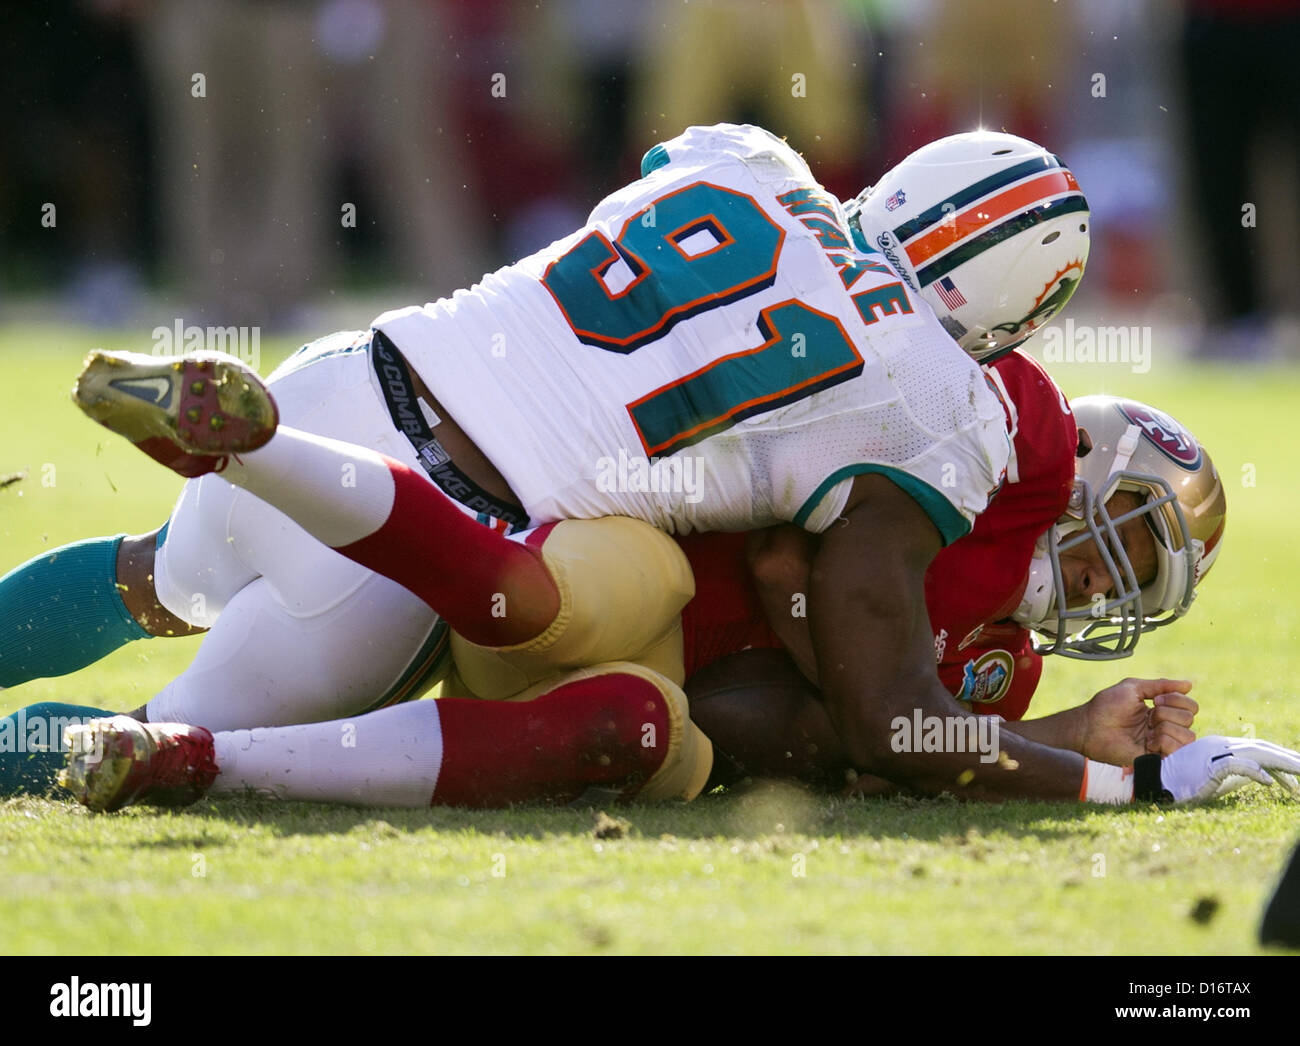 Dec. 9, 2012 - San Francisco, CA, USA - San Francisco 49ers quarterback Colin Kaepernick (7) sacked by Miami Dolphins - Stock Image